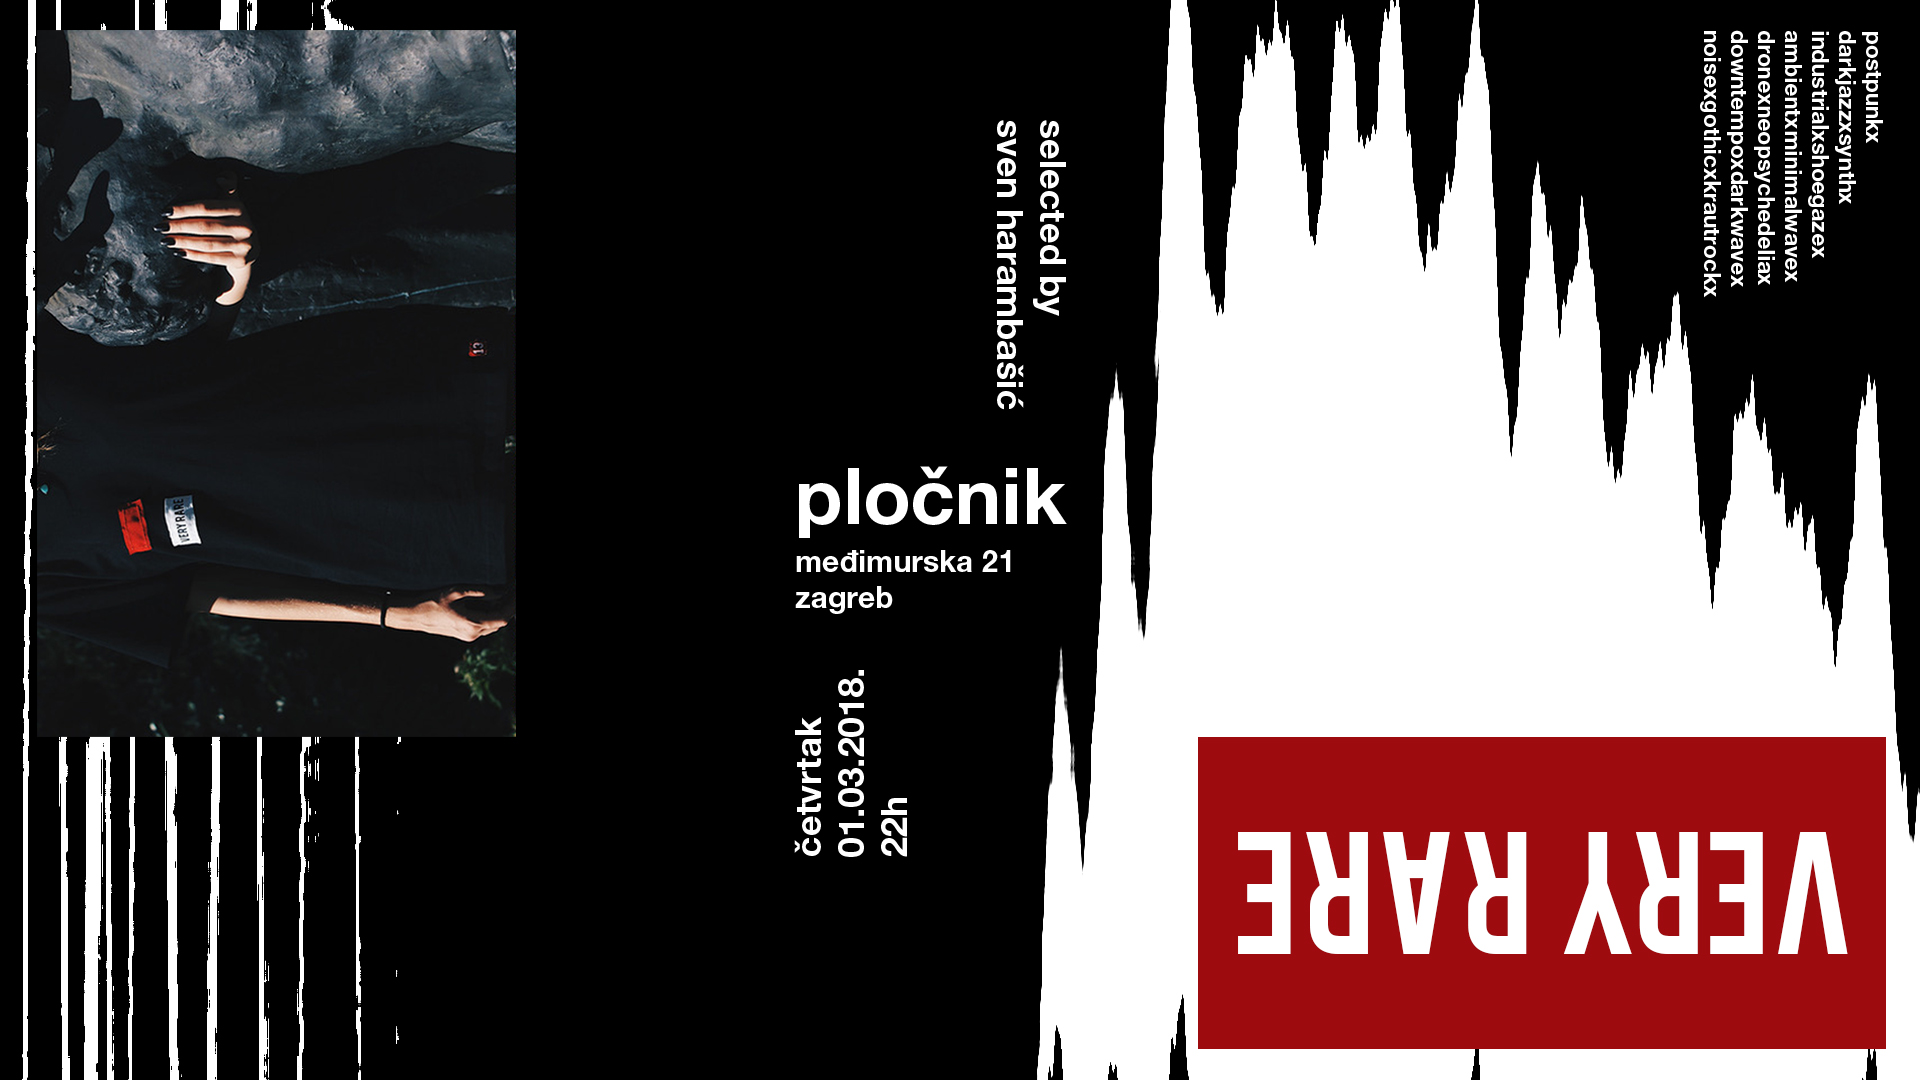 VERY RARE u Pločniku, a DJ night by Sven Harambasic, playing experimental, ambient, post-punk, industrial and darkwave music